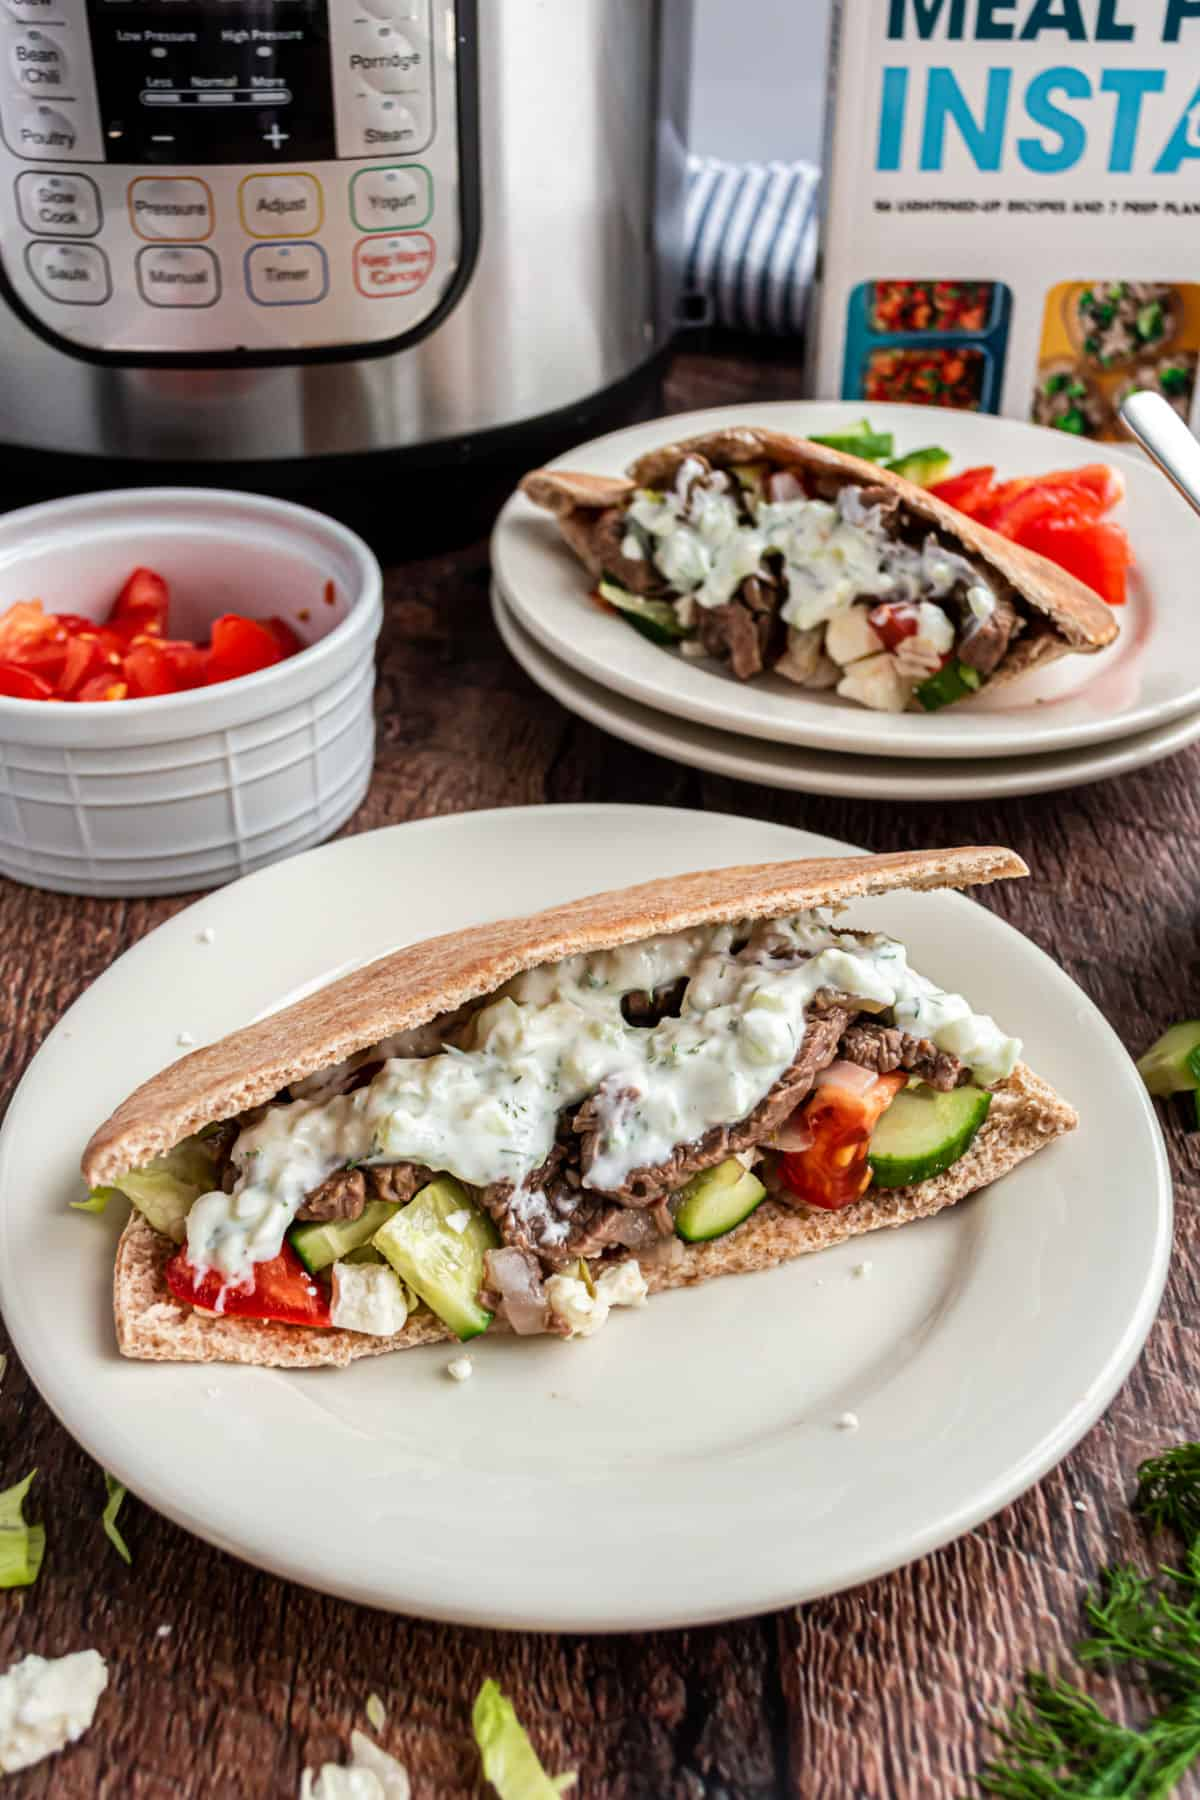 Beef gyro in pita with cucumber, tomato, onion, and tzatziki sauce.